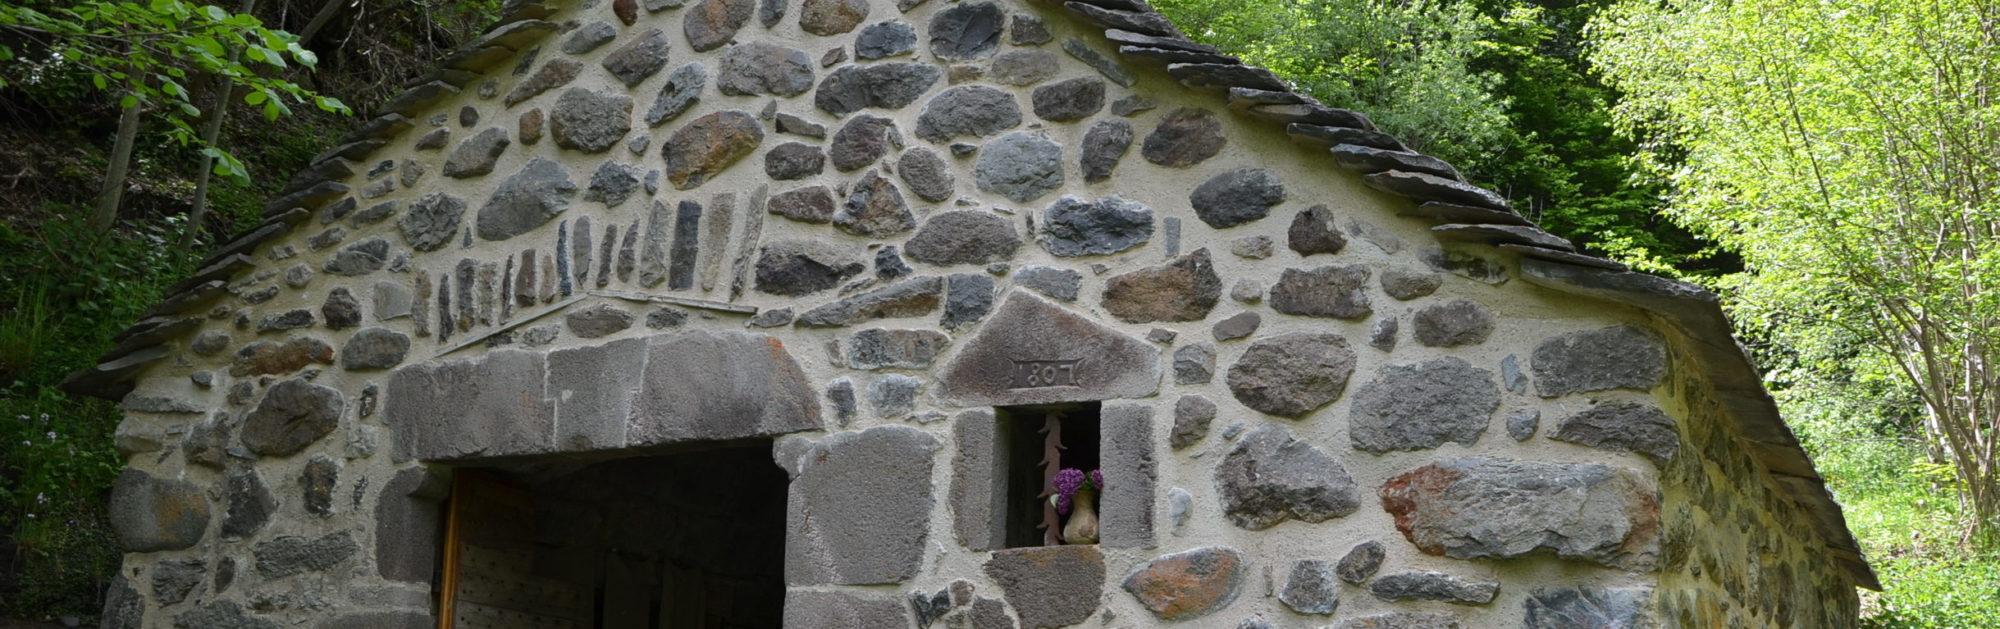 Le moulin de Drils. Photo ©Alta Terra